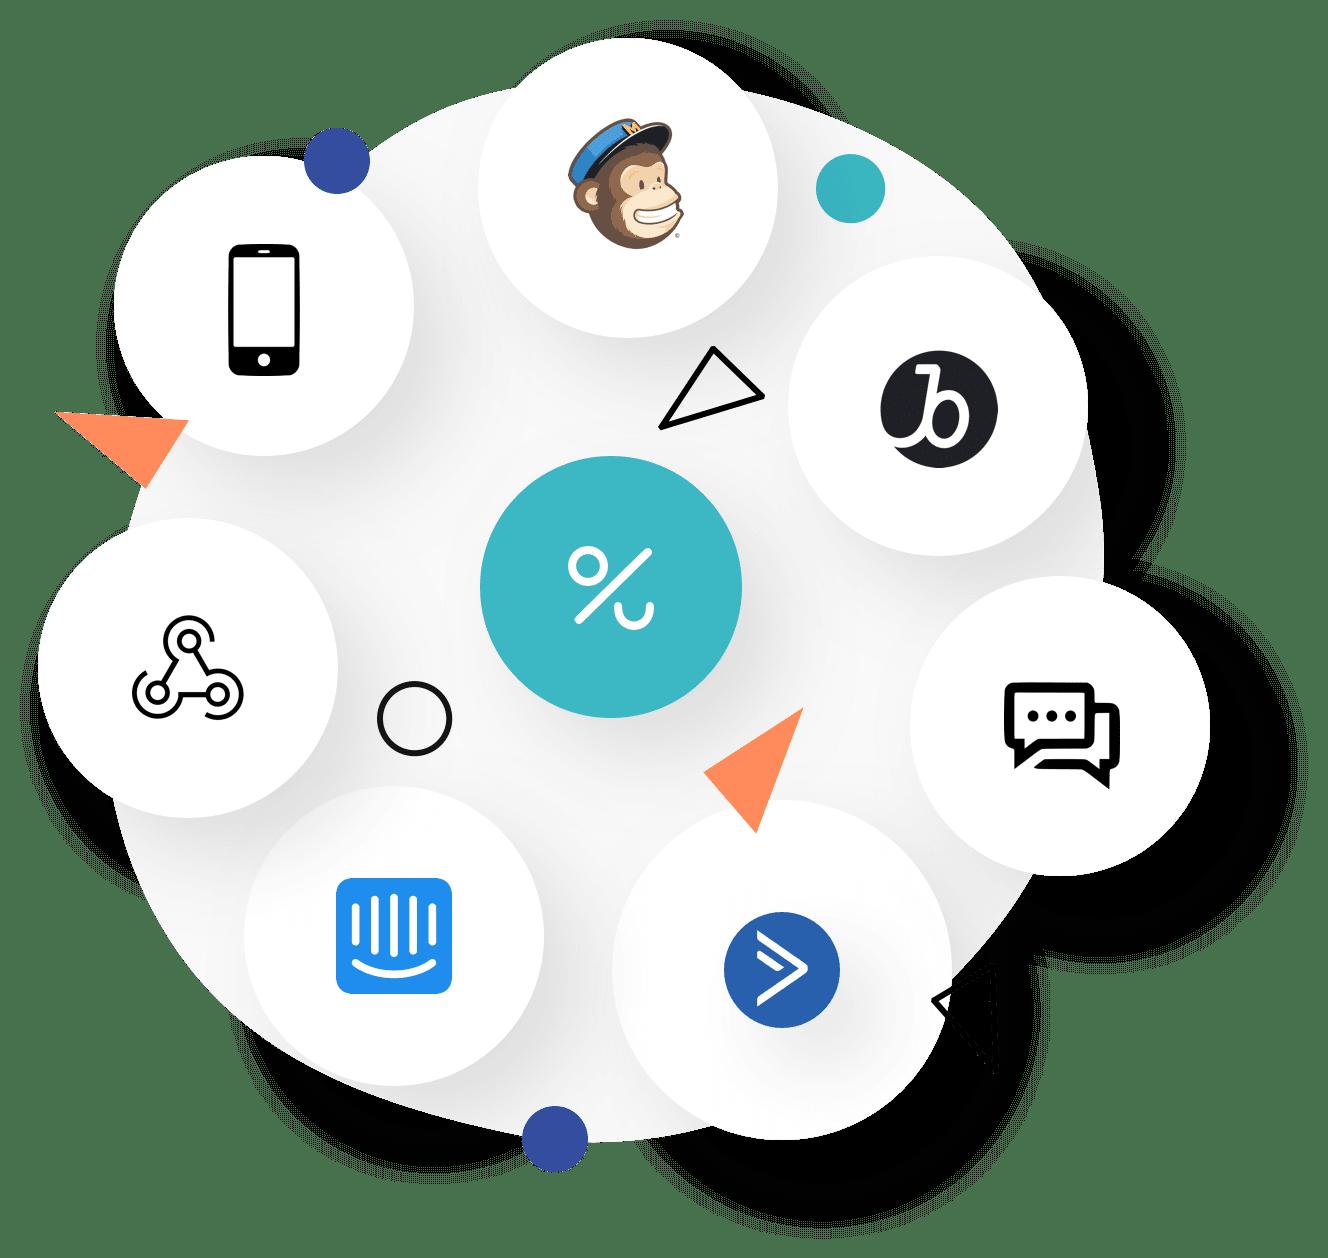 Distribution channels loyalty program software